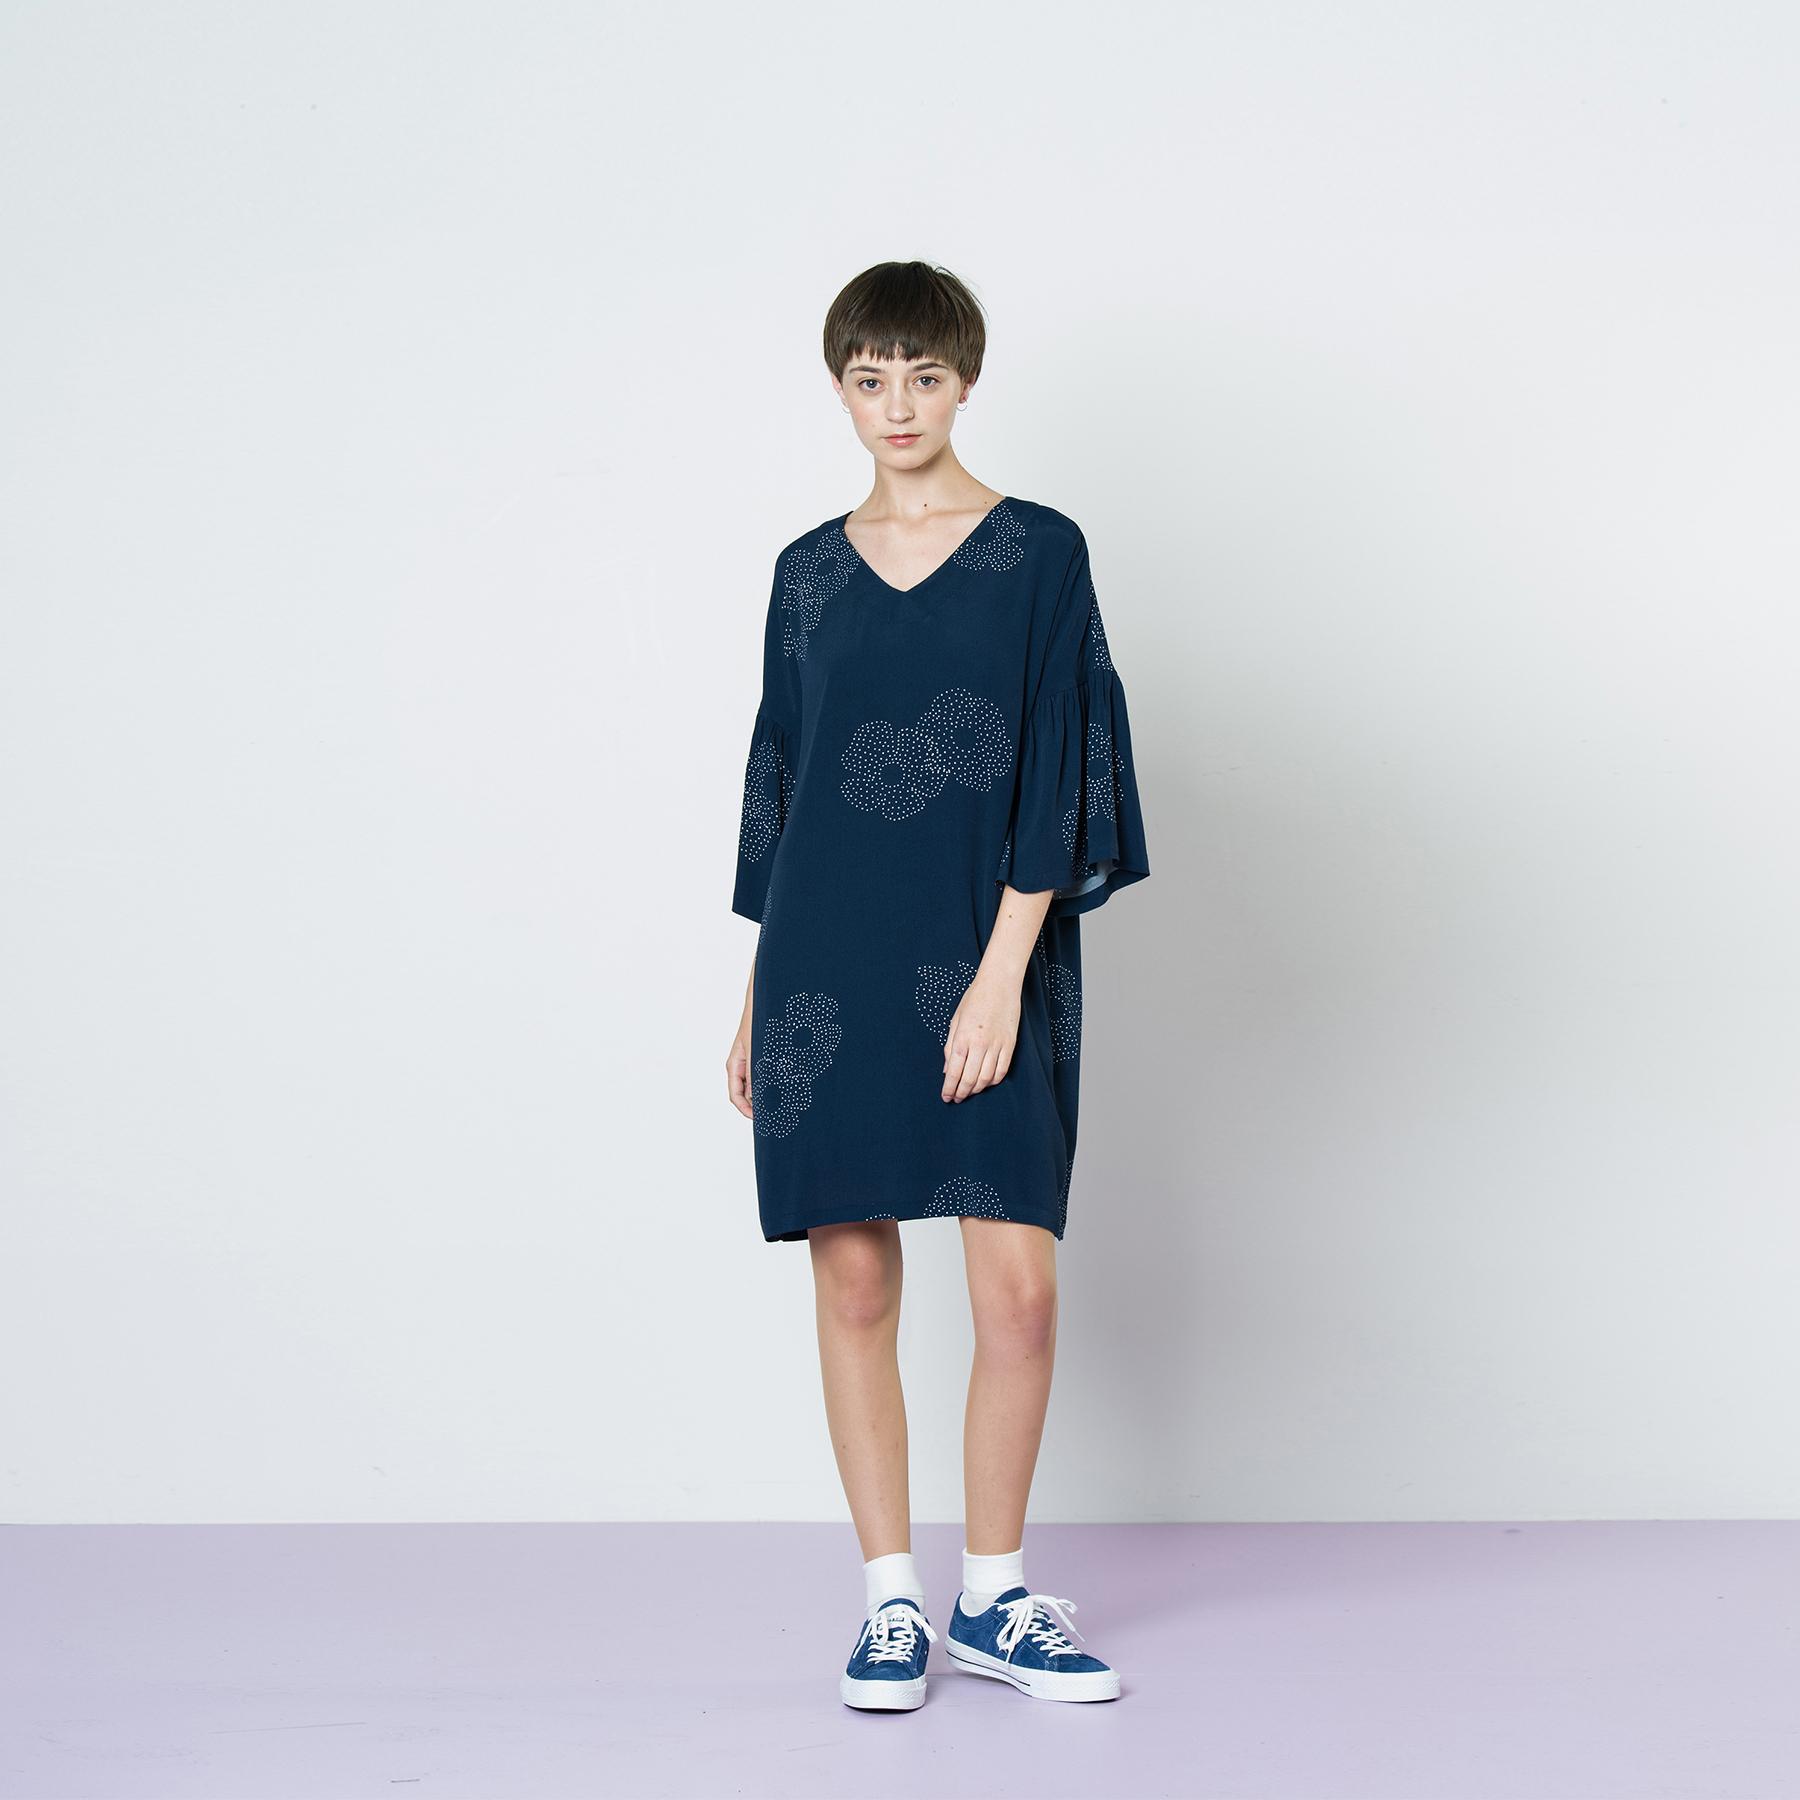 LB squares_0002_49. Prototype dress.jpg